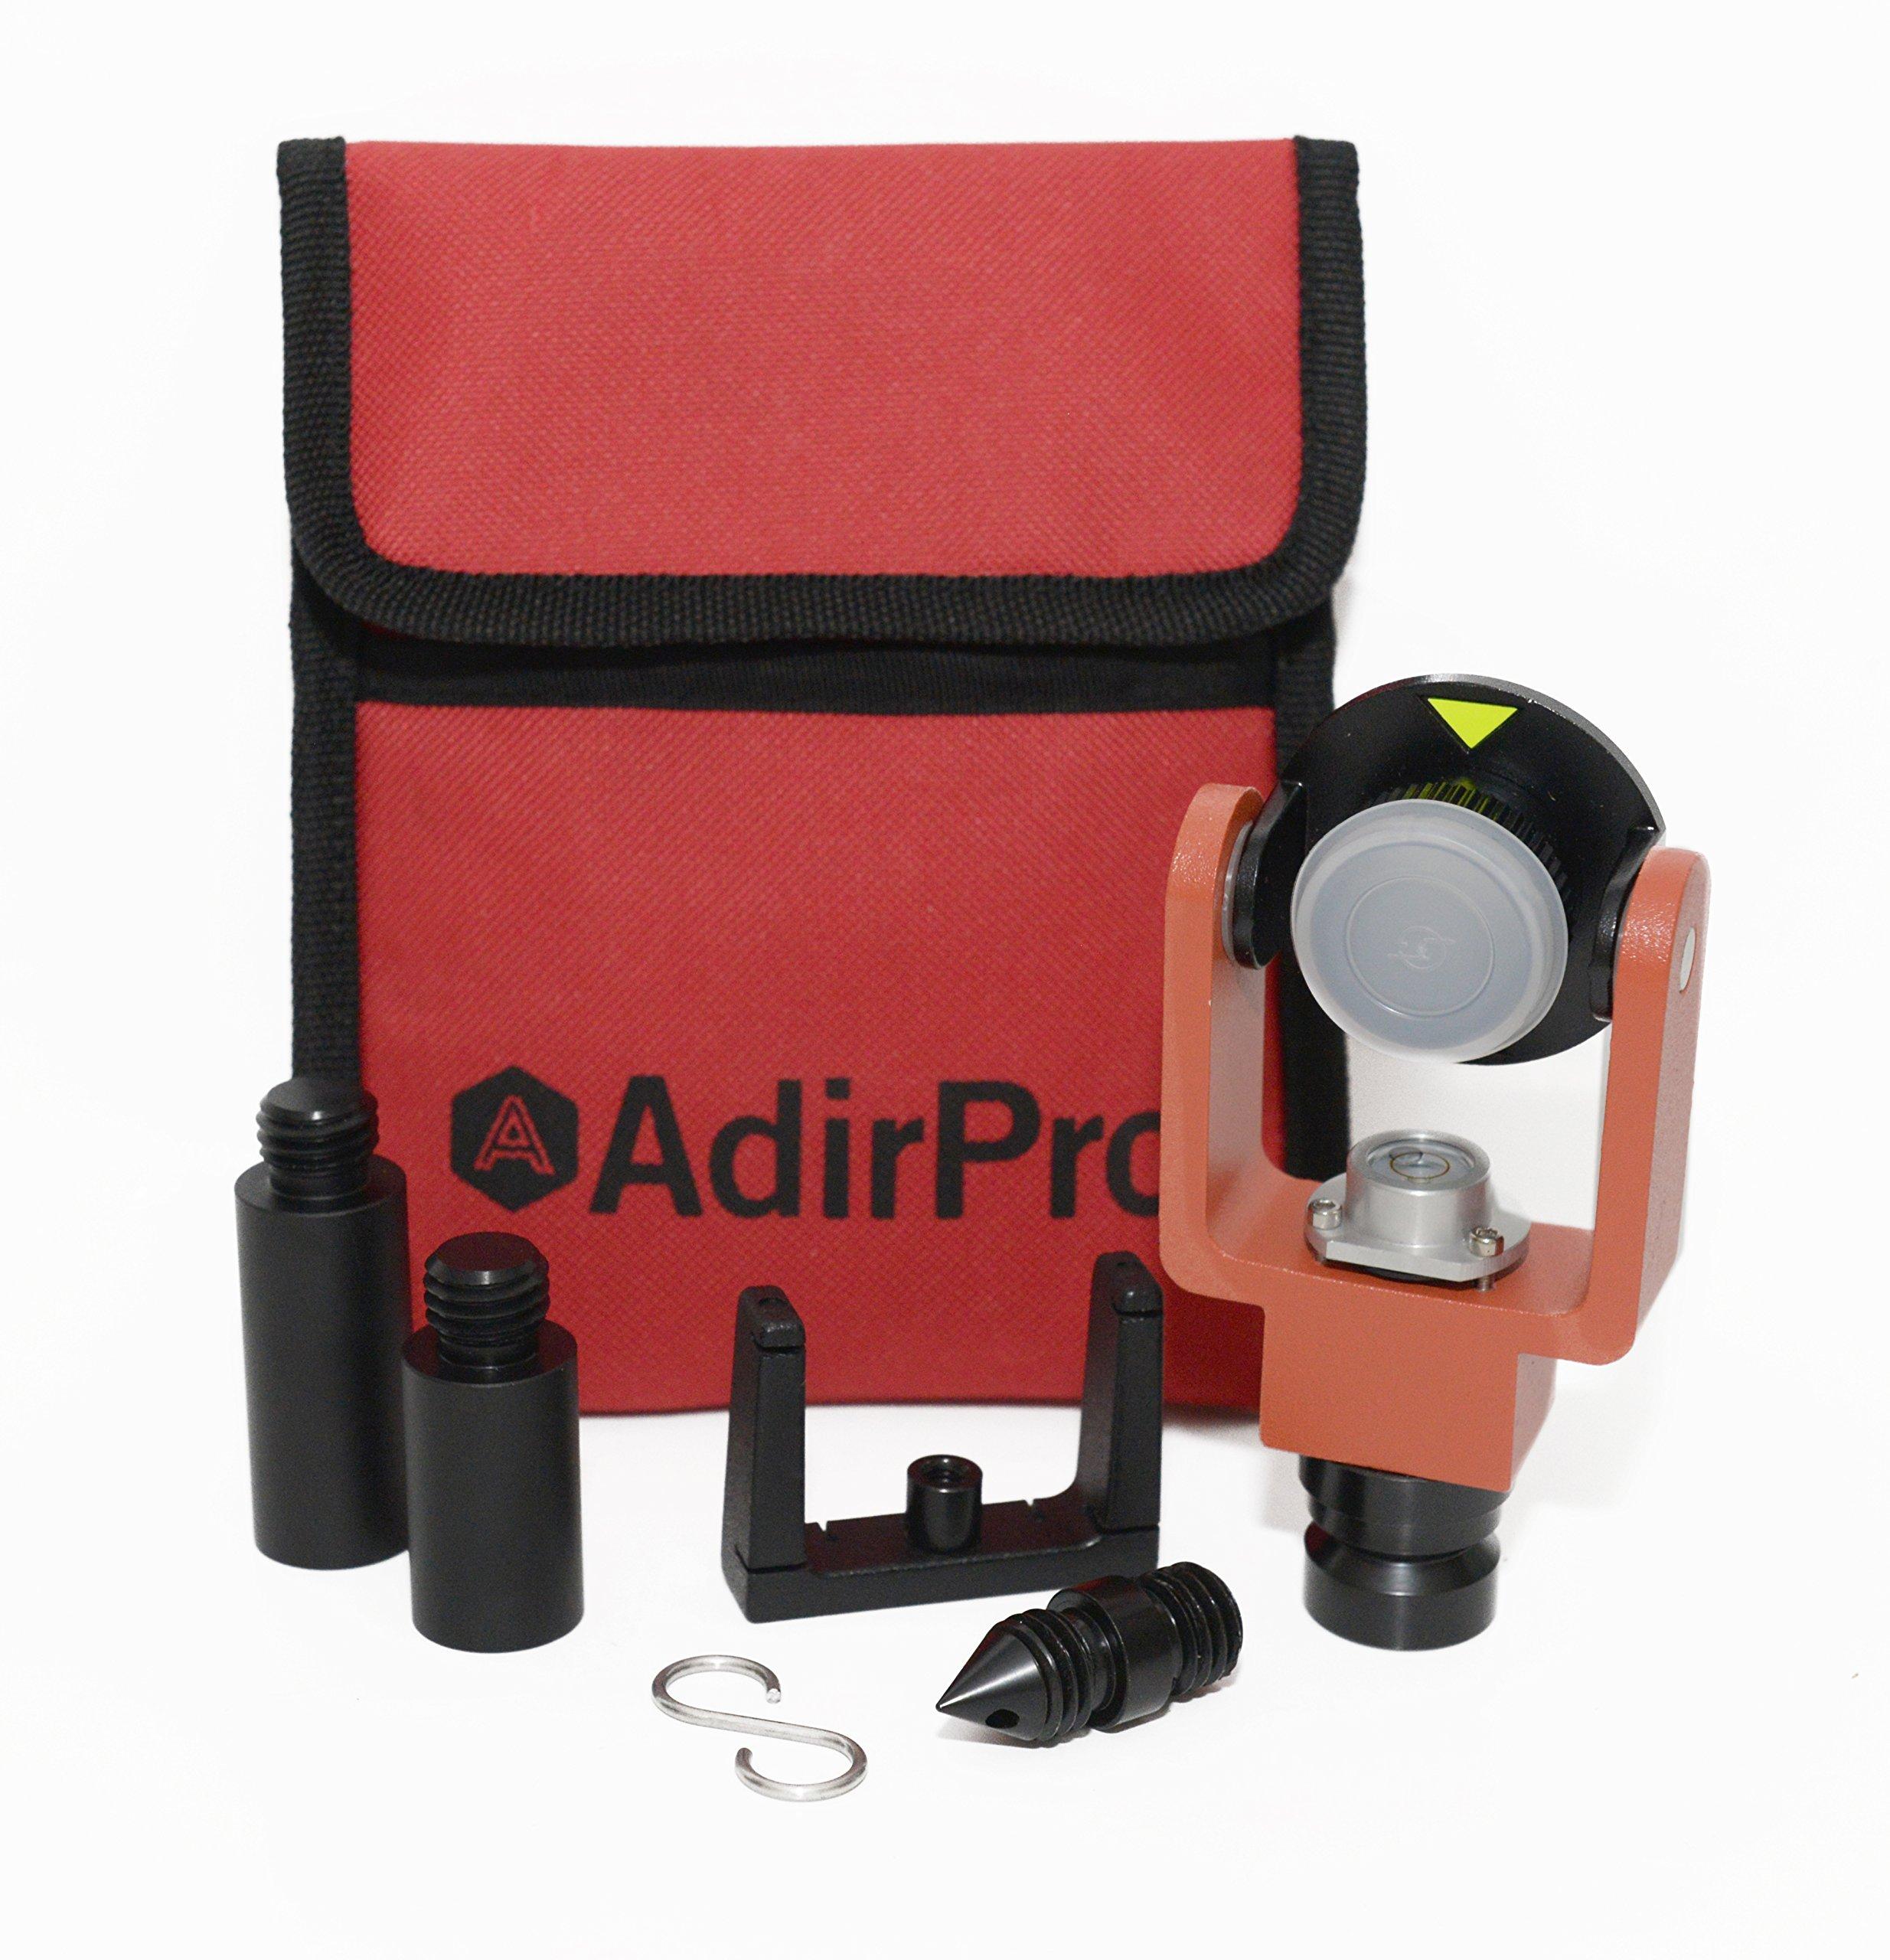 AdirPro Mini Prism System with Center Vial 720-04